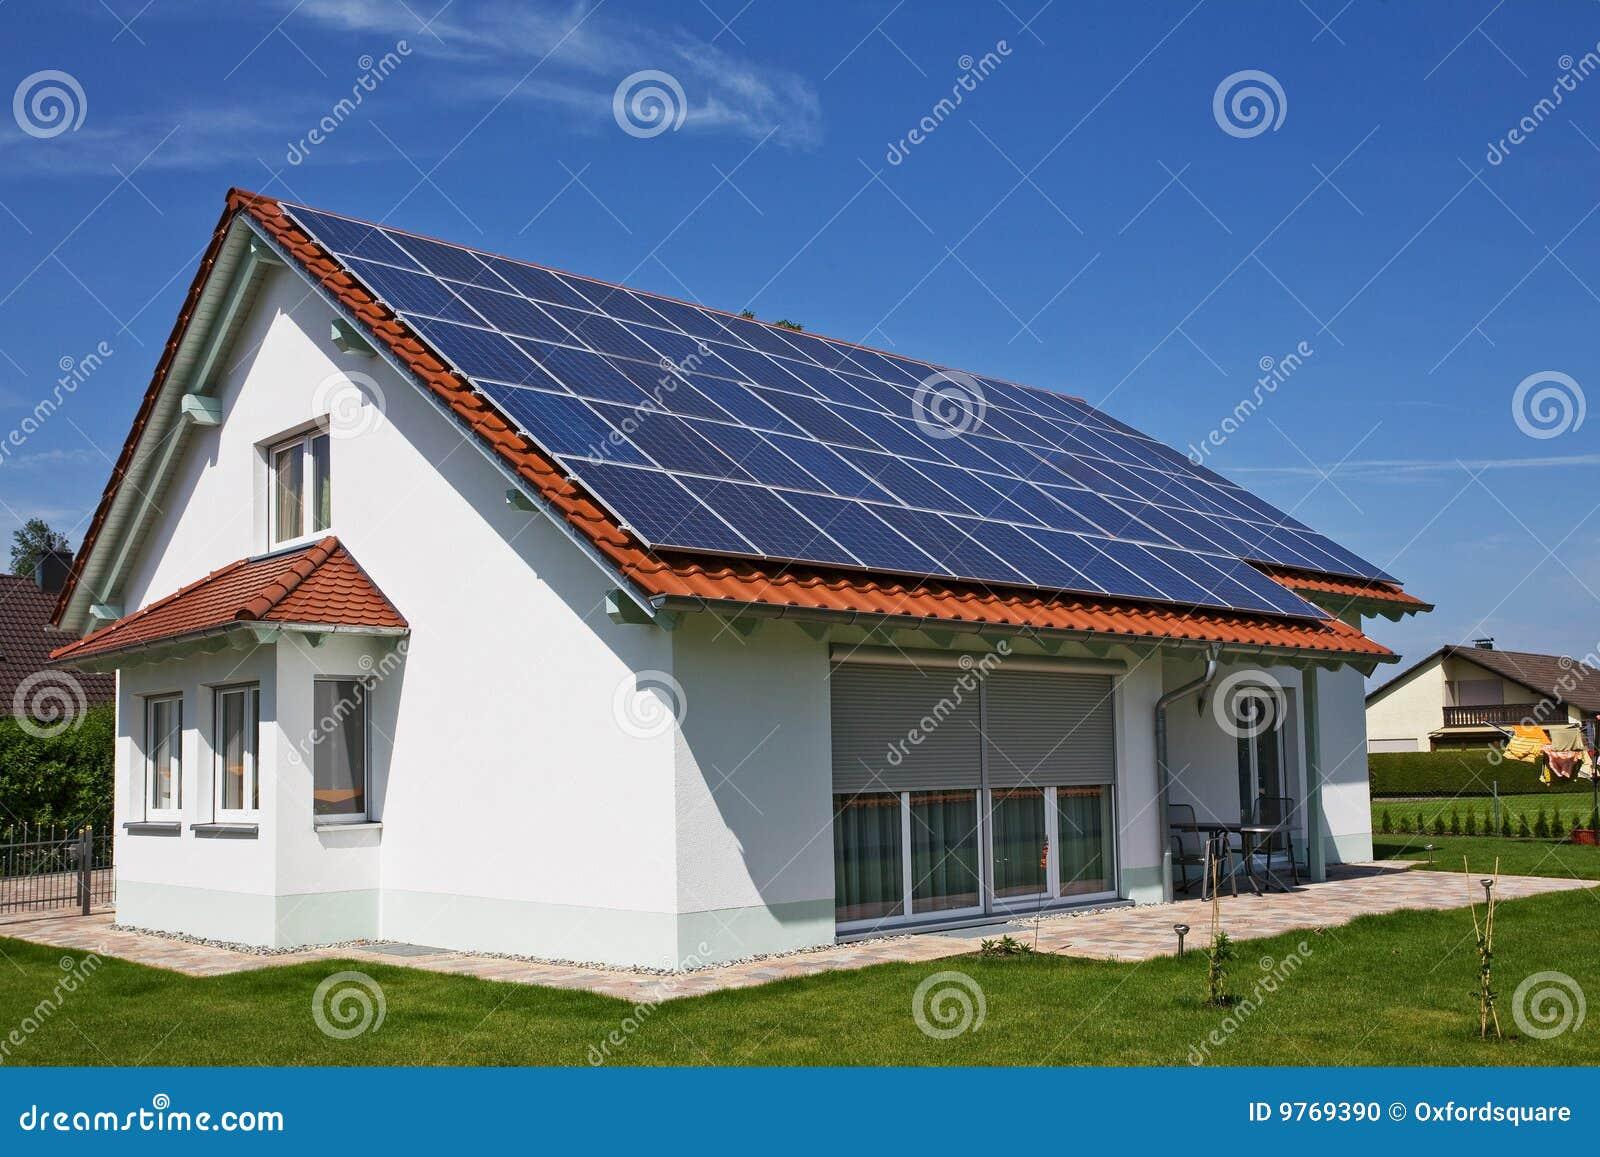 House solar panel stock photo image of modern for Solar homes